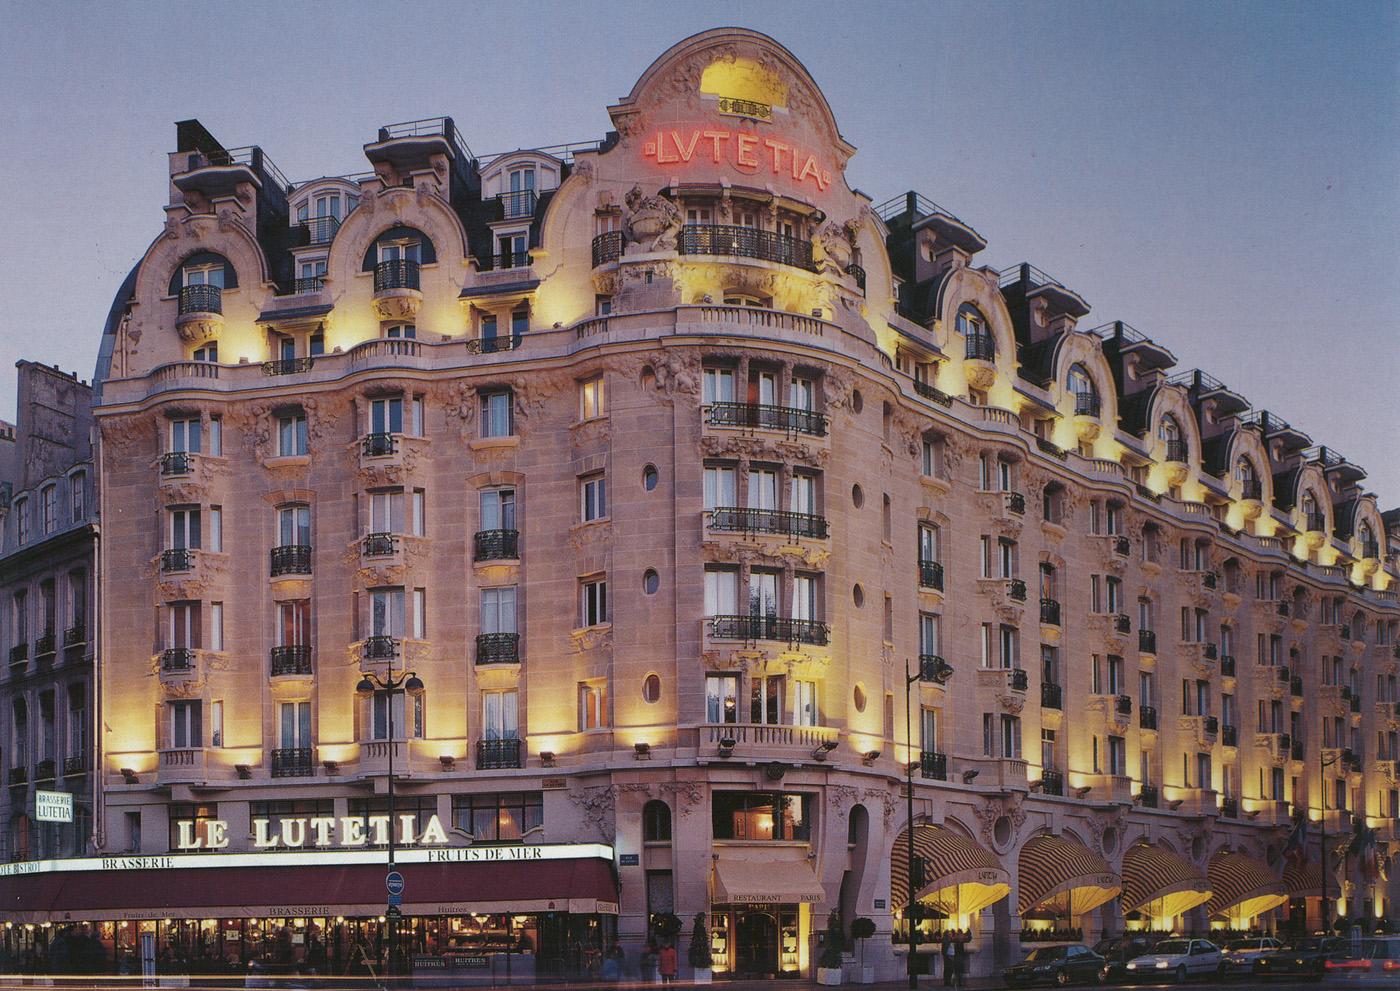 Lutetia hotel parijs keycardsysteem OTD toegangscontrole DormaKaba RFID